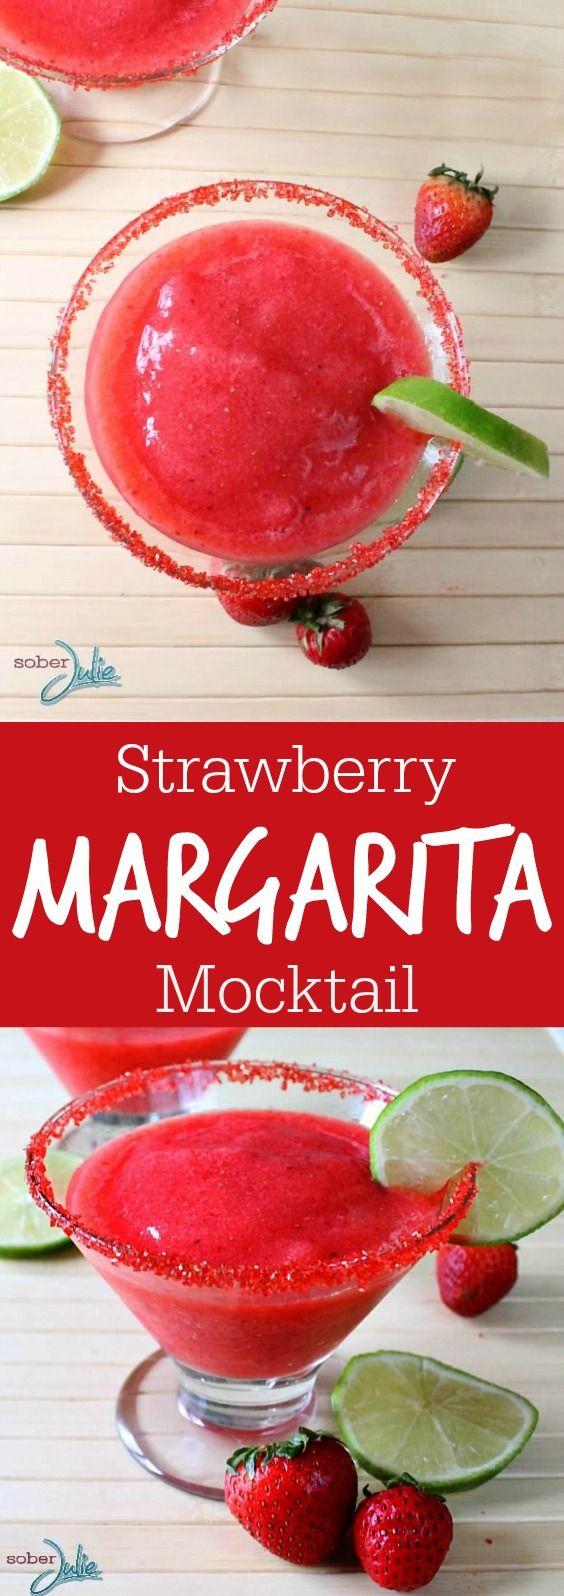 strawberry margarita mocktail non alcoholic drink recipe